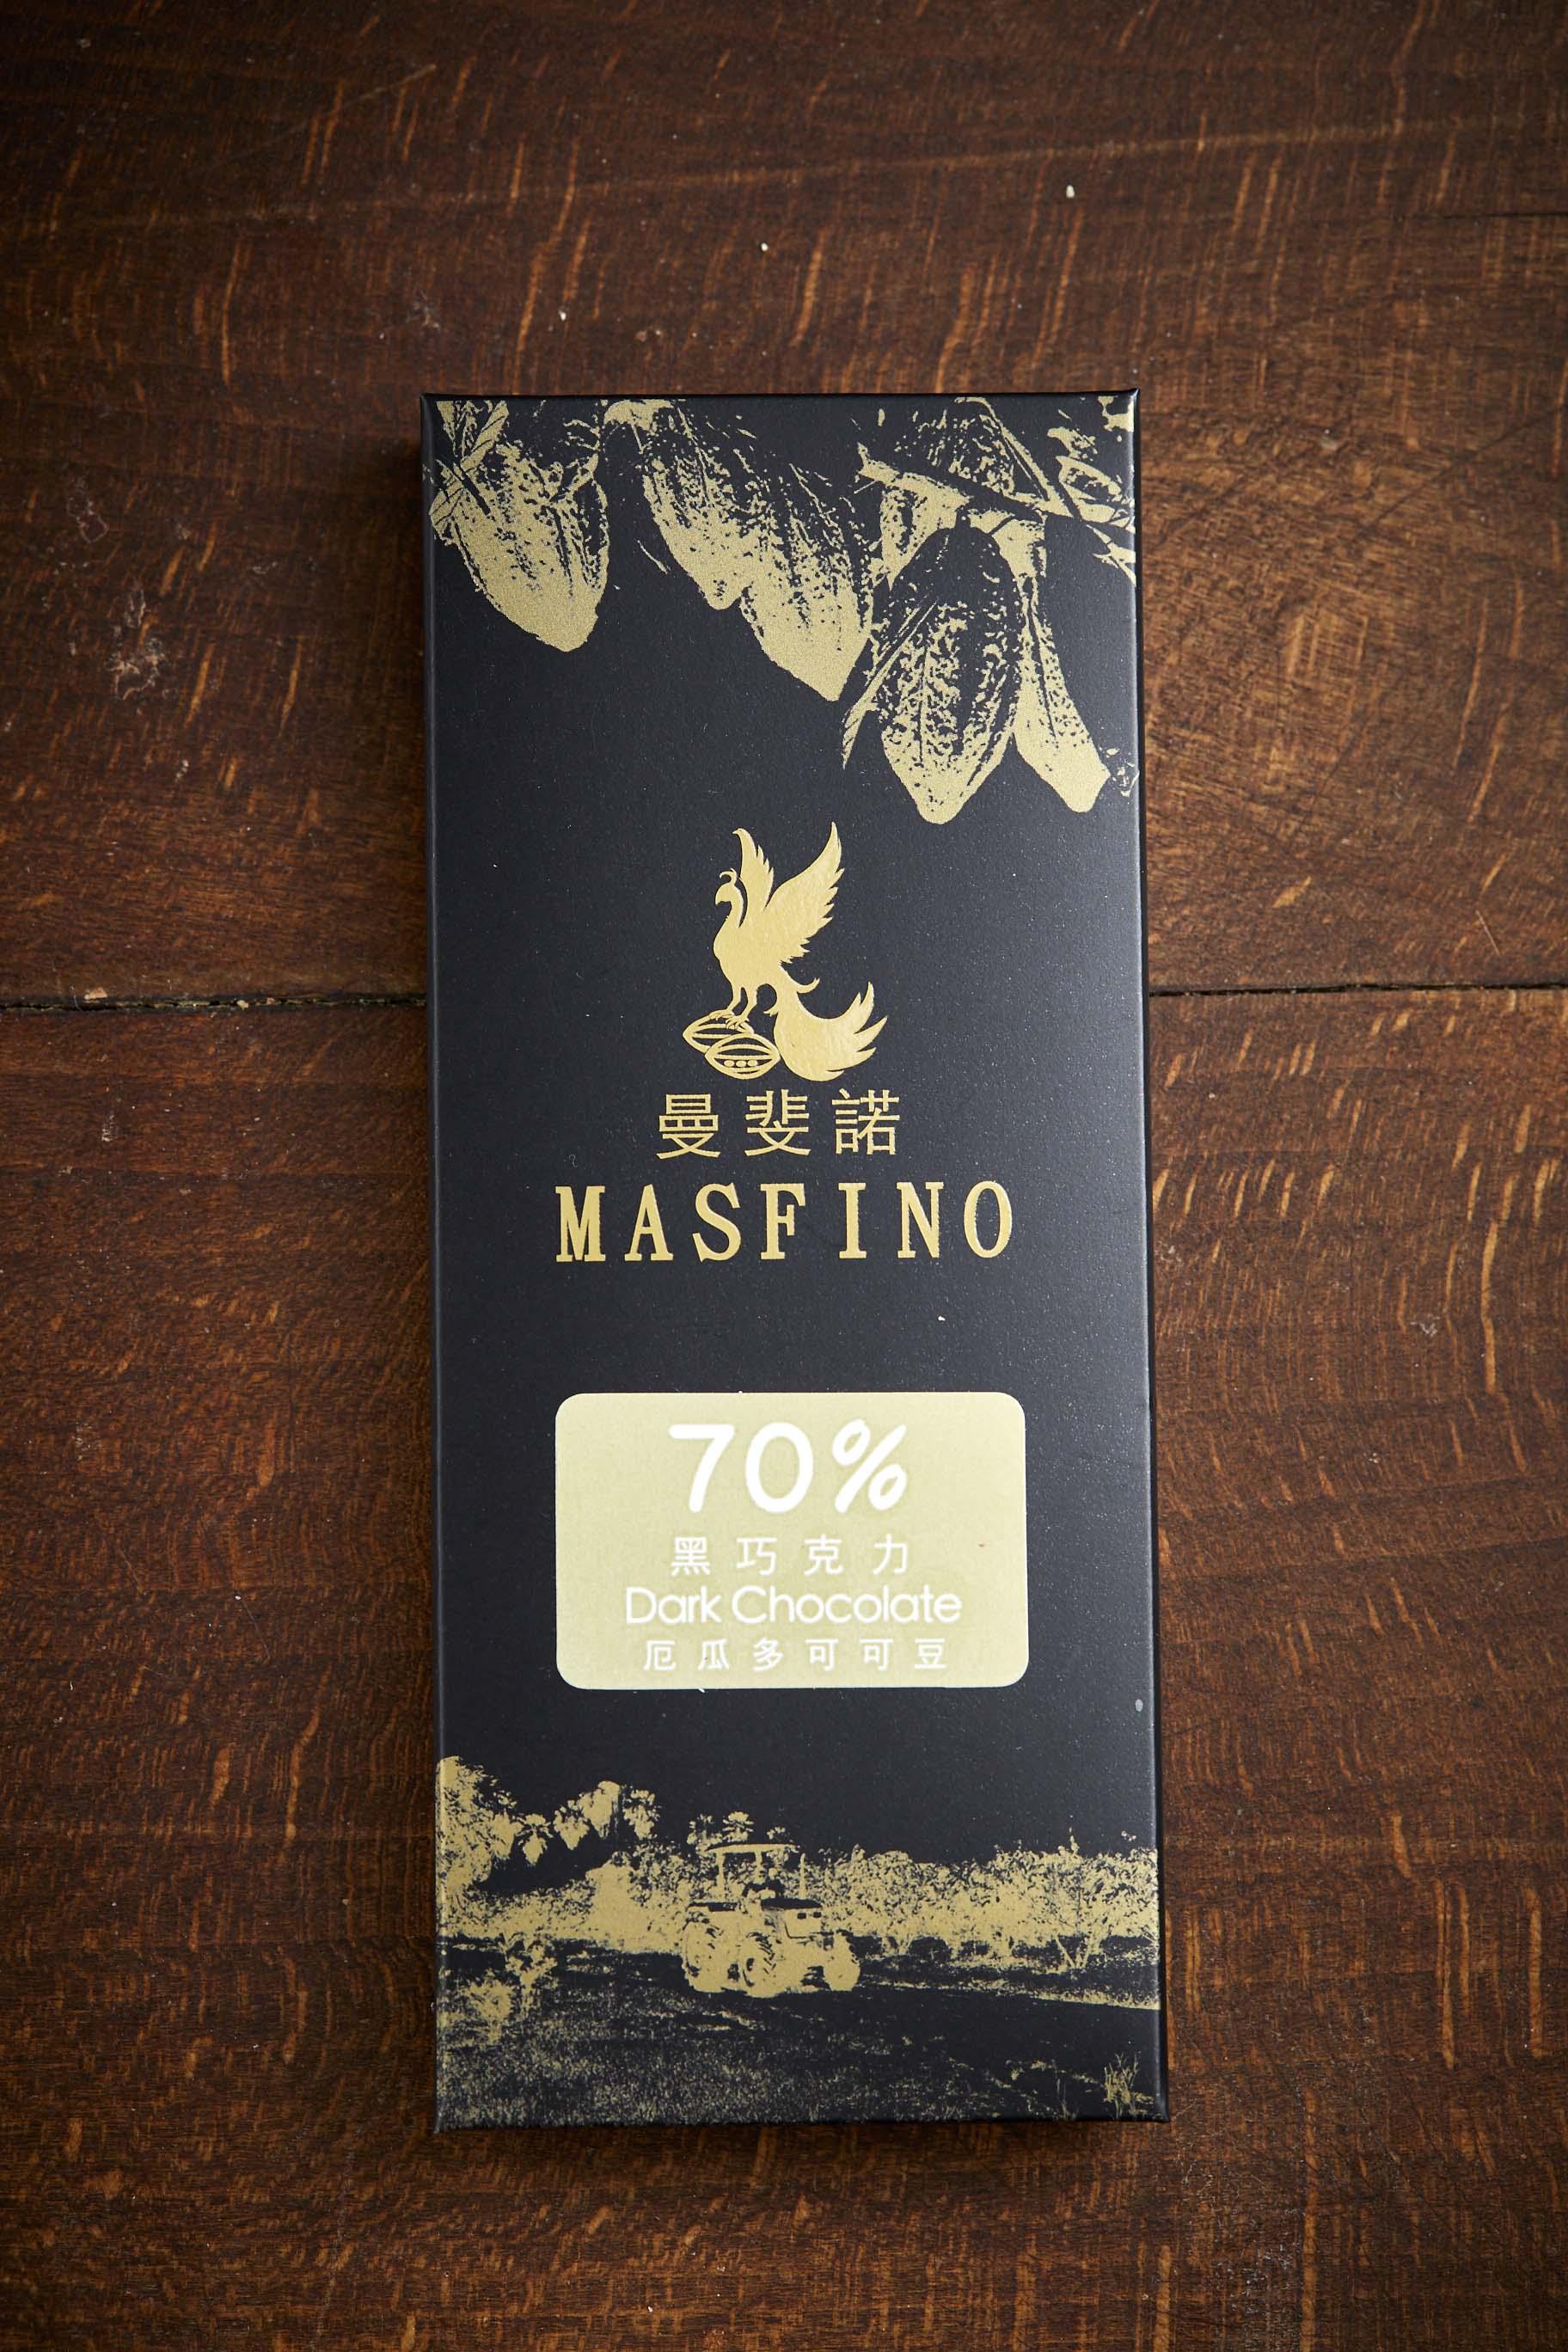 70% Dark Chocolate Bar   Enjoy the natural flavor of Ecuadorian cacao beans with our 70% Dark Chocolate bar. No artificial or natural flavors were added.  Ingredients: Ecuadorian Cacao, Organic Sugar, Cacao Butter   Shop Now!